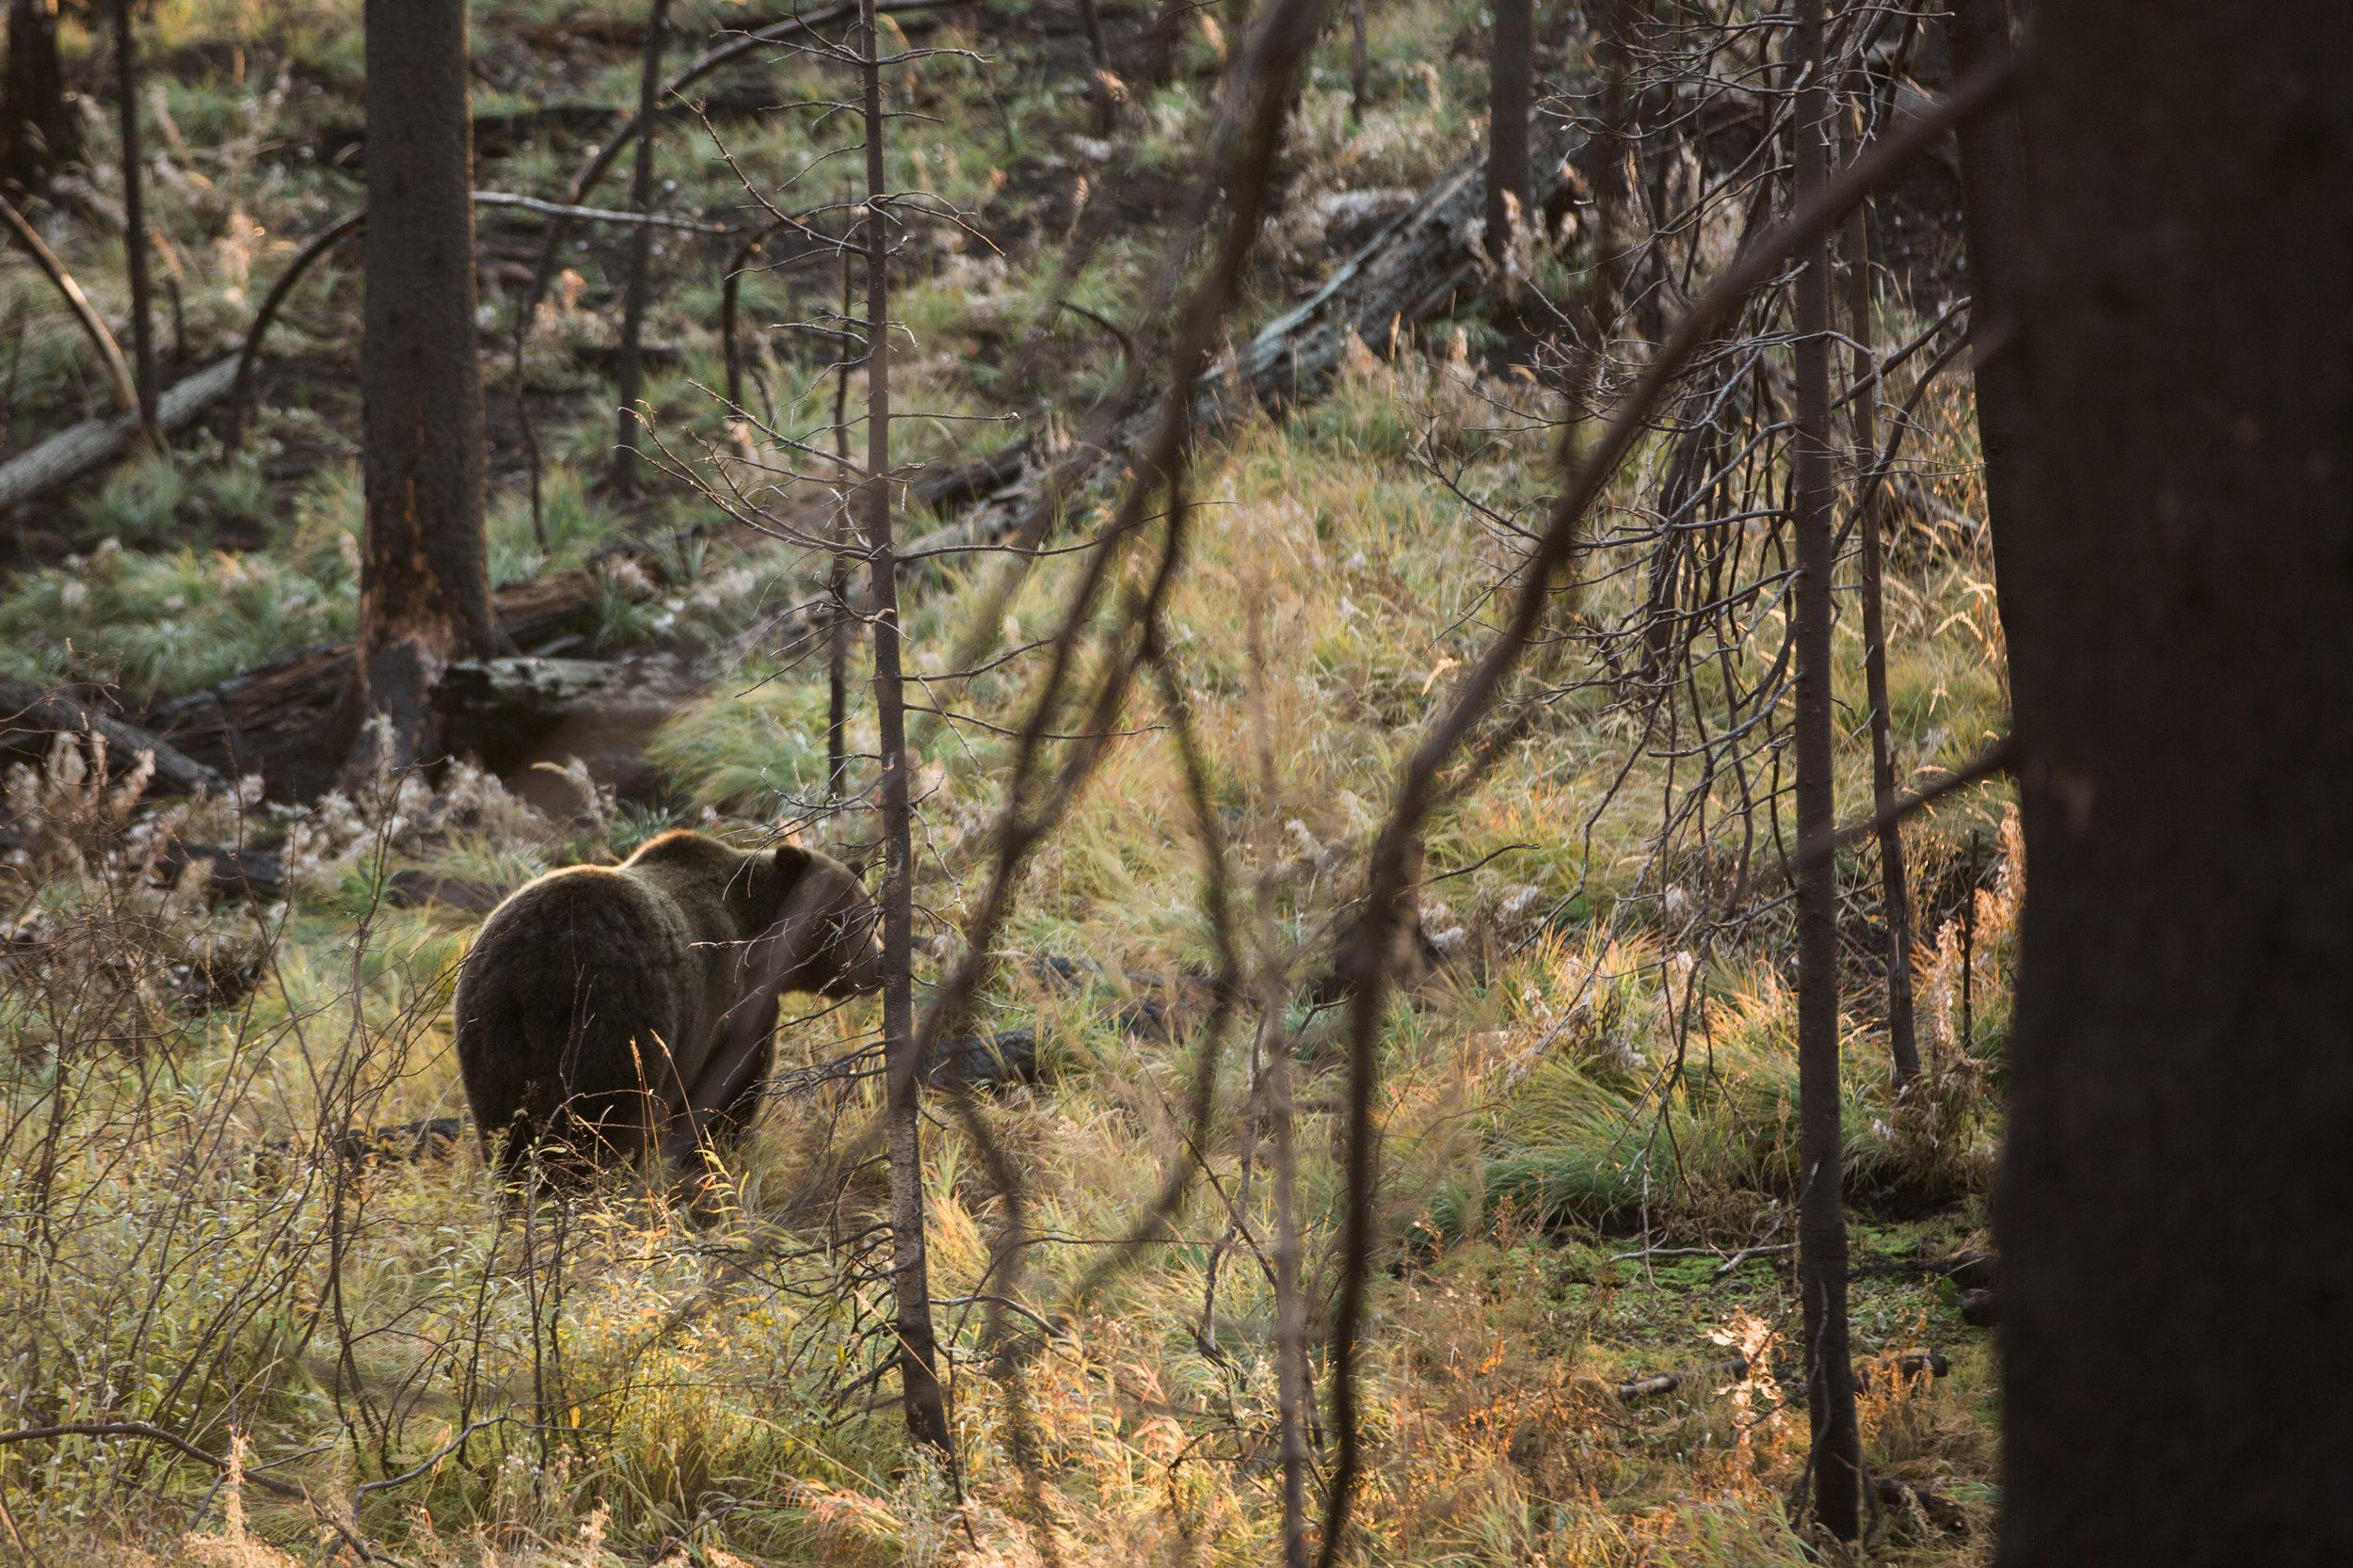 CindyGiovagnoli_outdoor_adventure_photography_Grand_Teton_Yellowstone_Glacier_National_Park_Montana_Wyoming_South_Dakota_Mount_Rushmore_Badlands-013.jpg